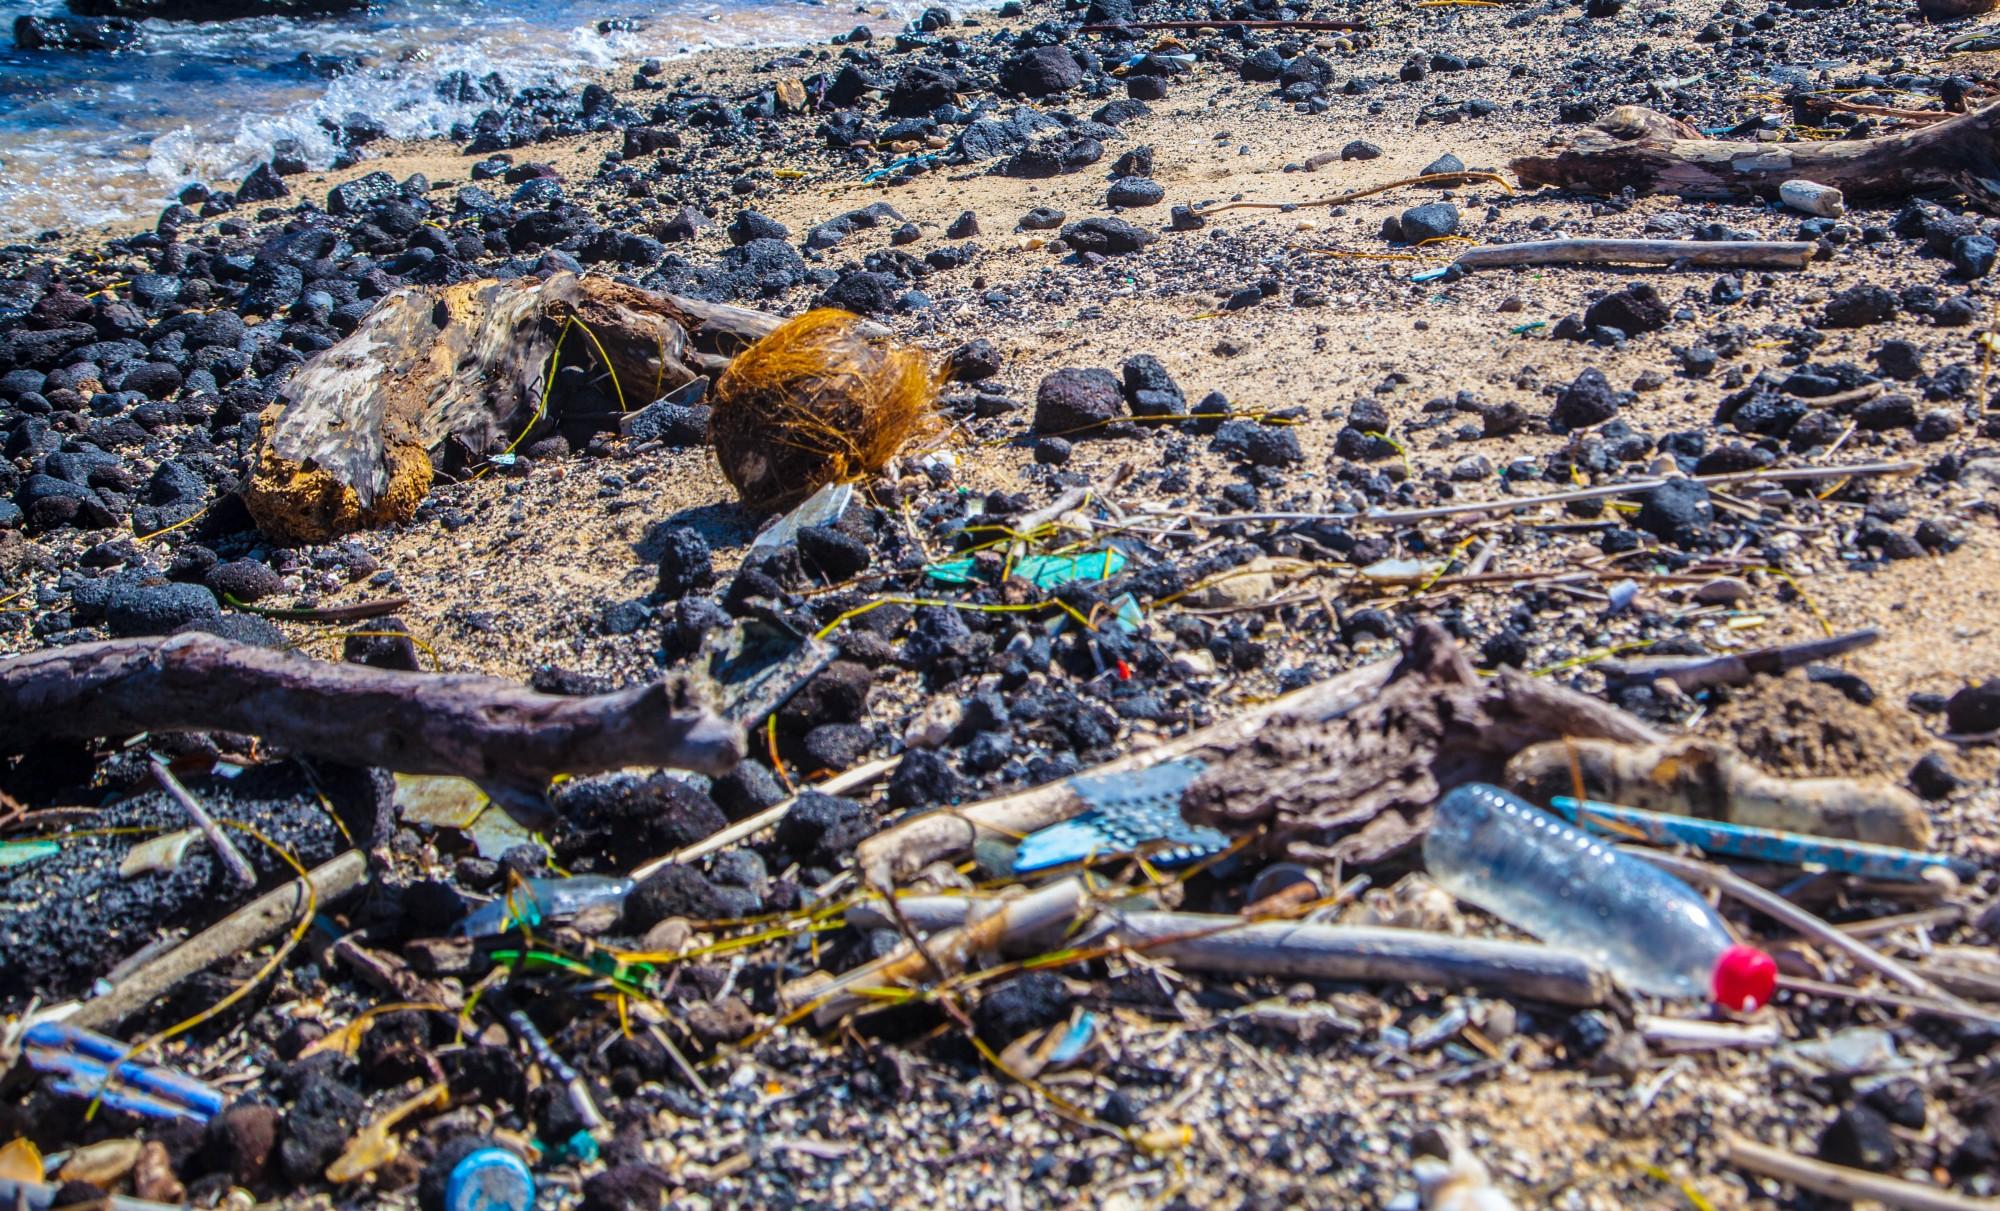 Ocean plastic waste getting you down? Bust through the Negativity Bias: Become a Problem Lover - By leyla acaroglu